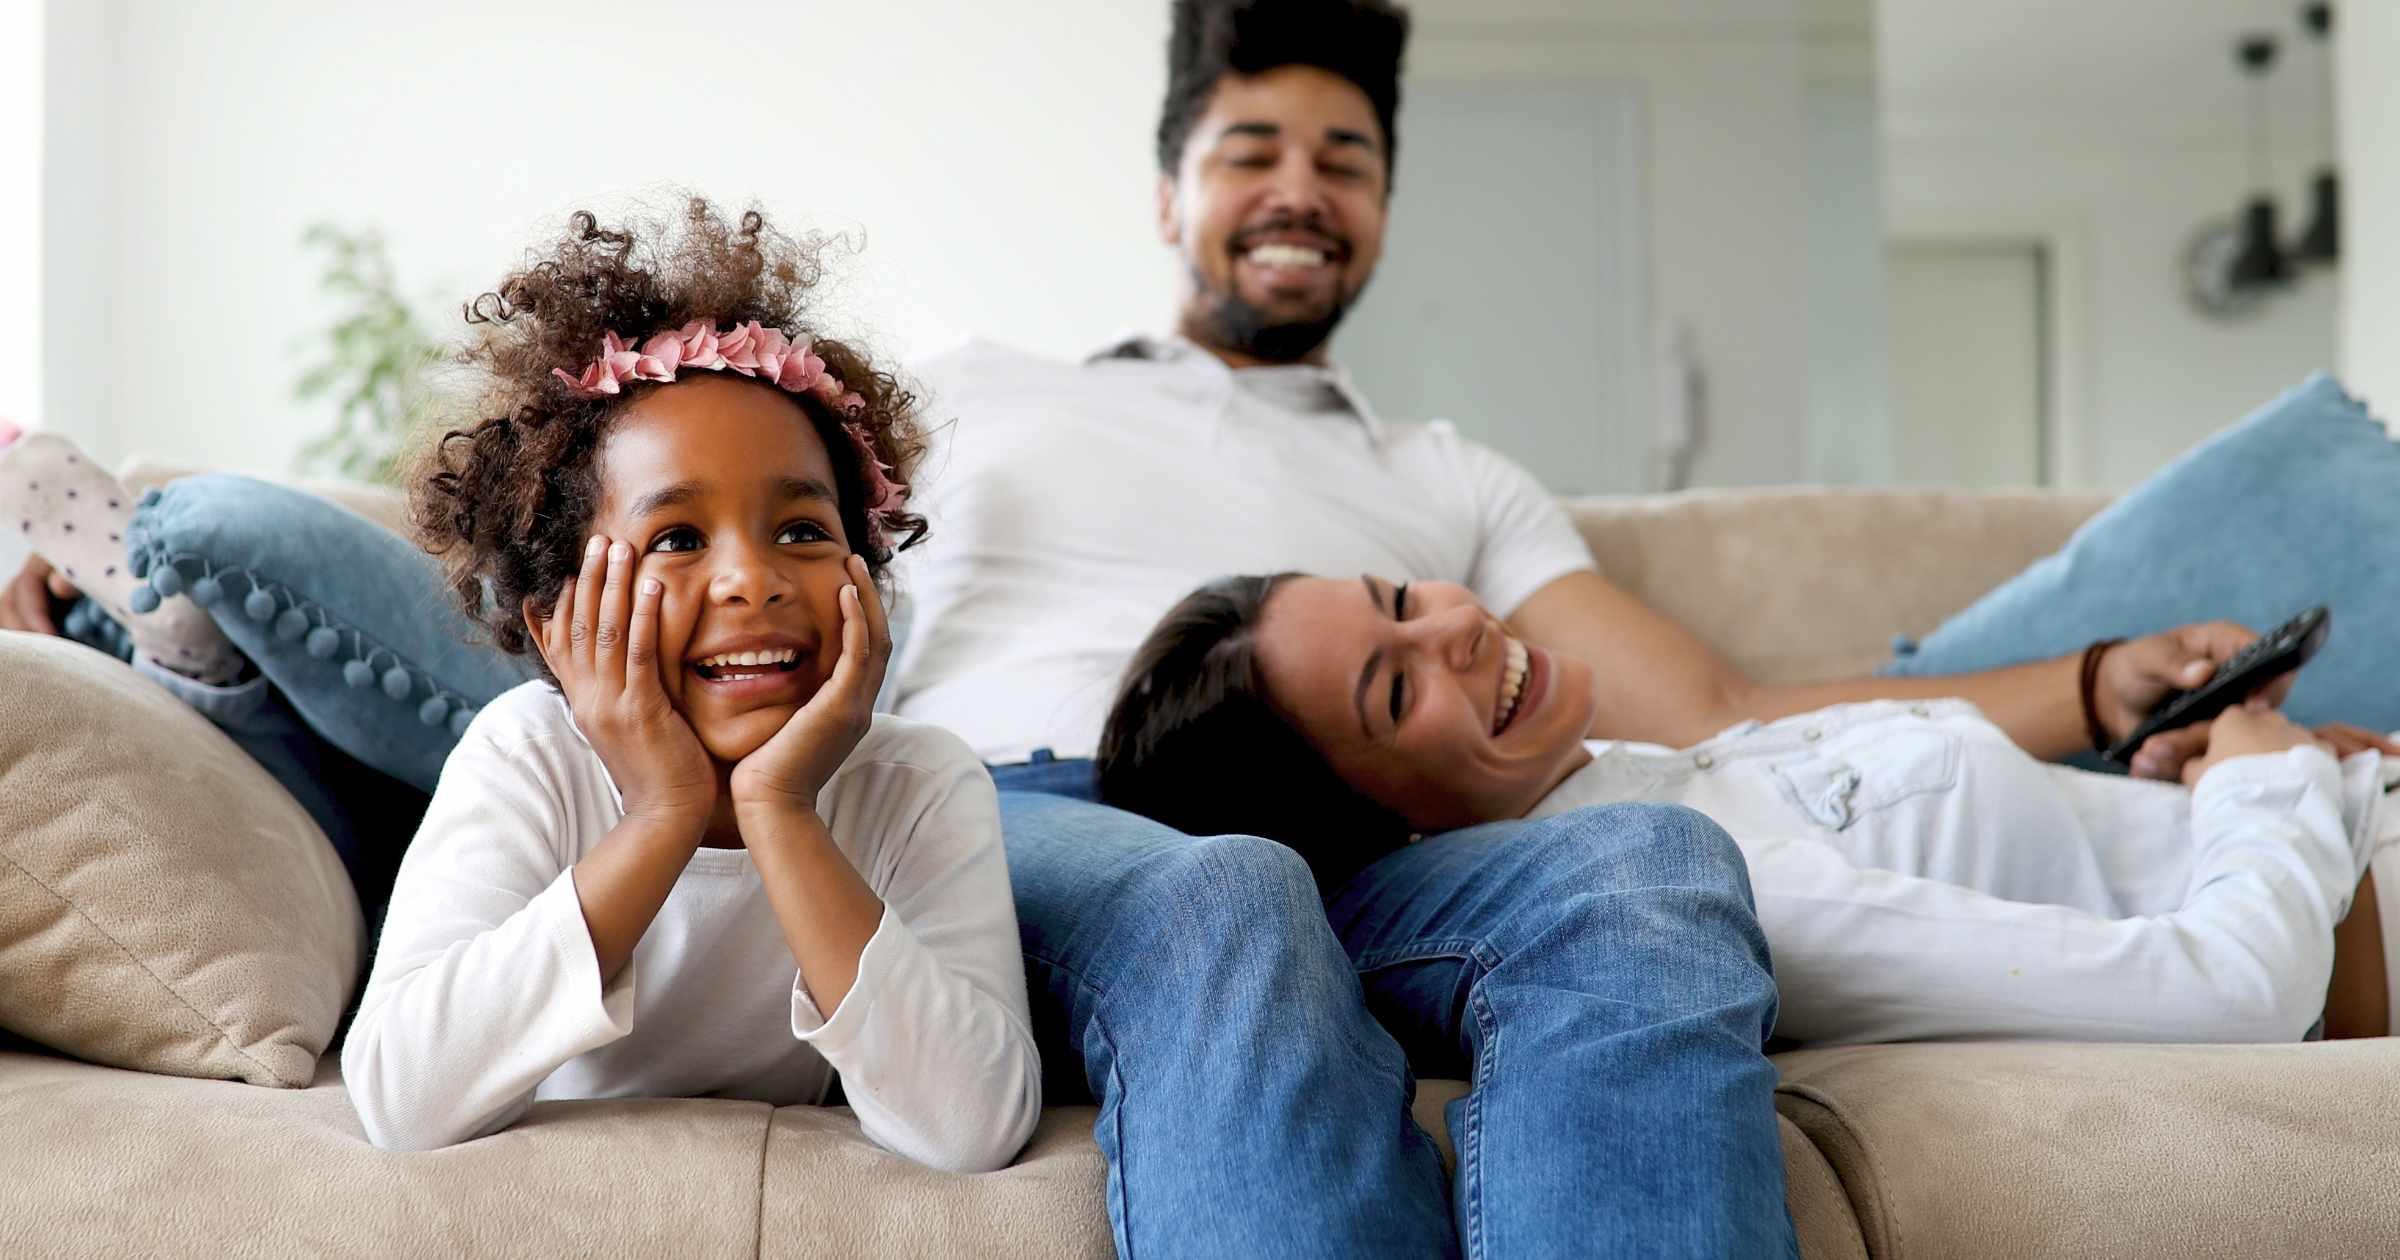 Family enjoying cinema sound together.